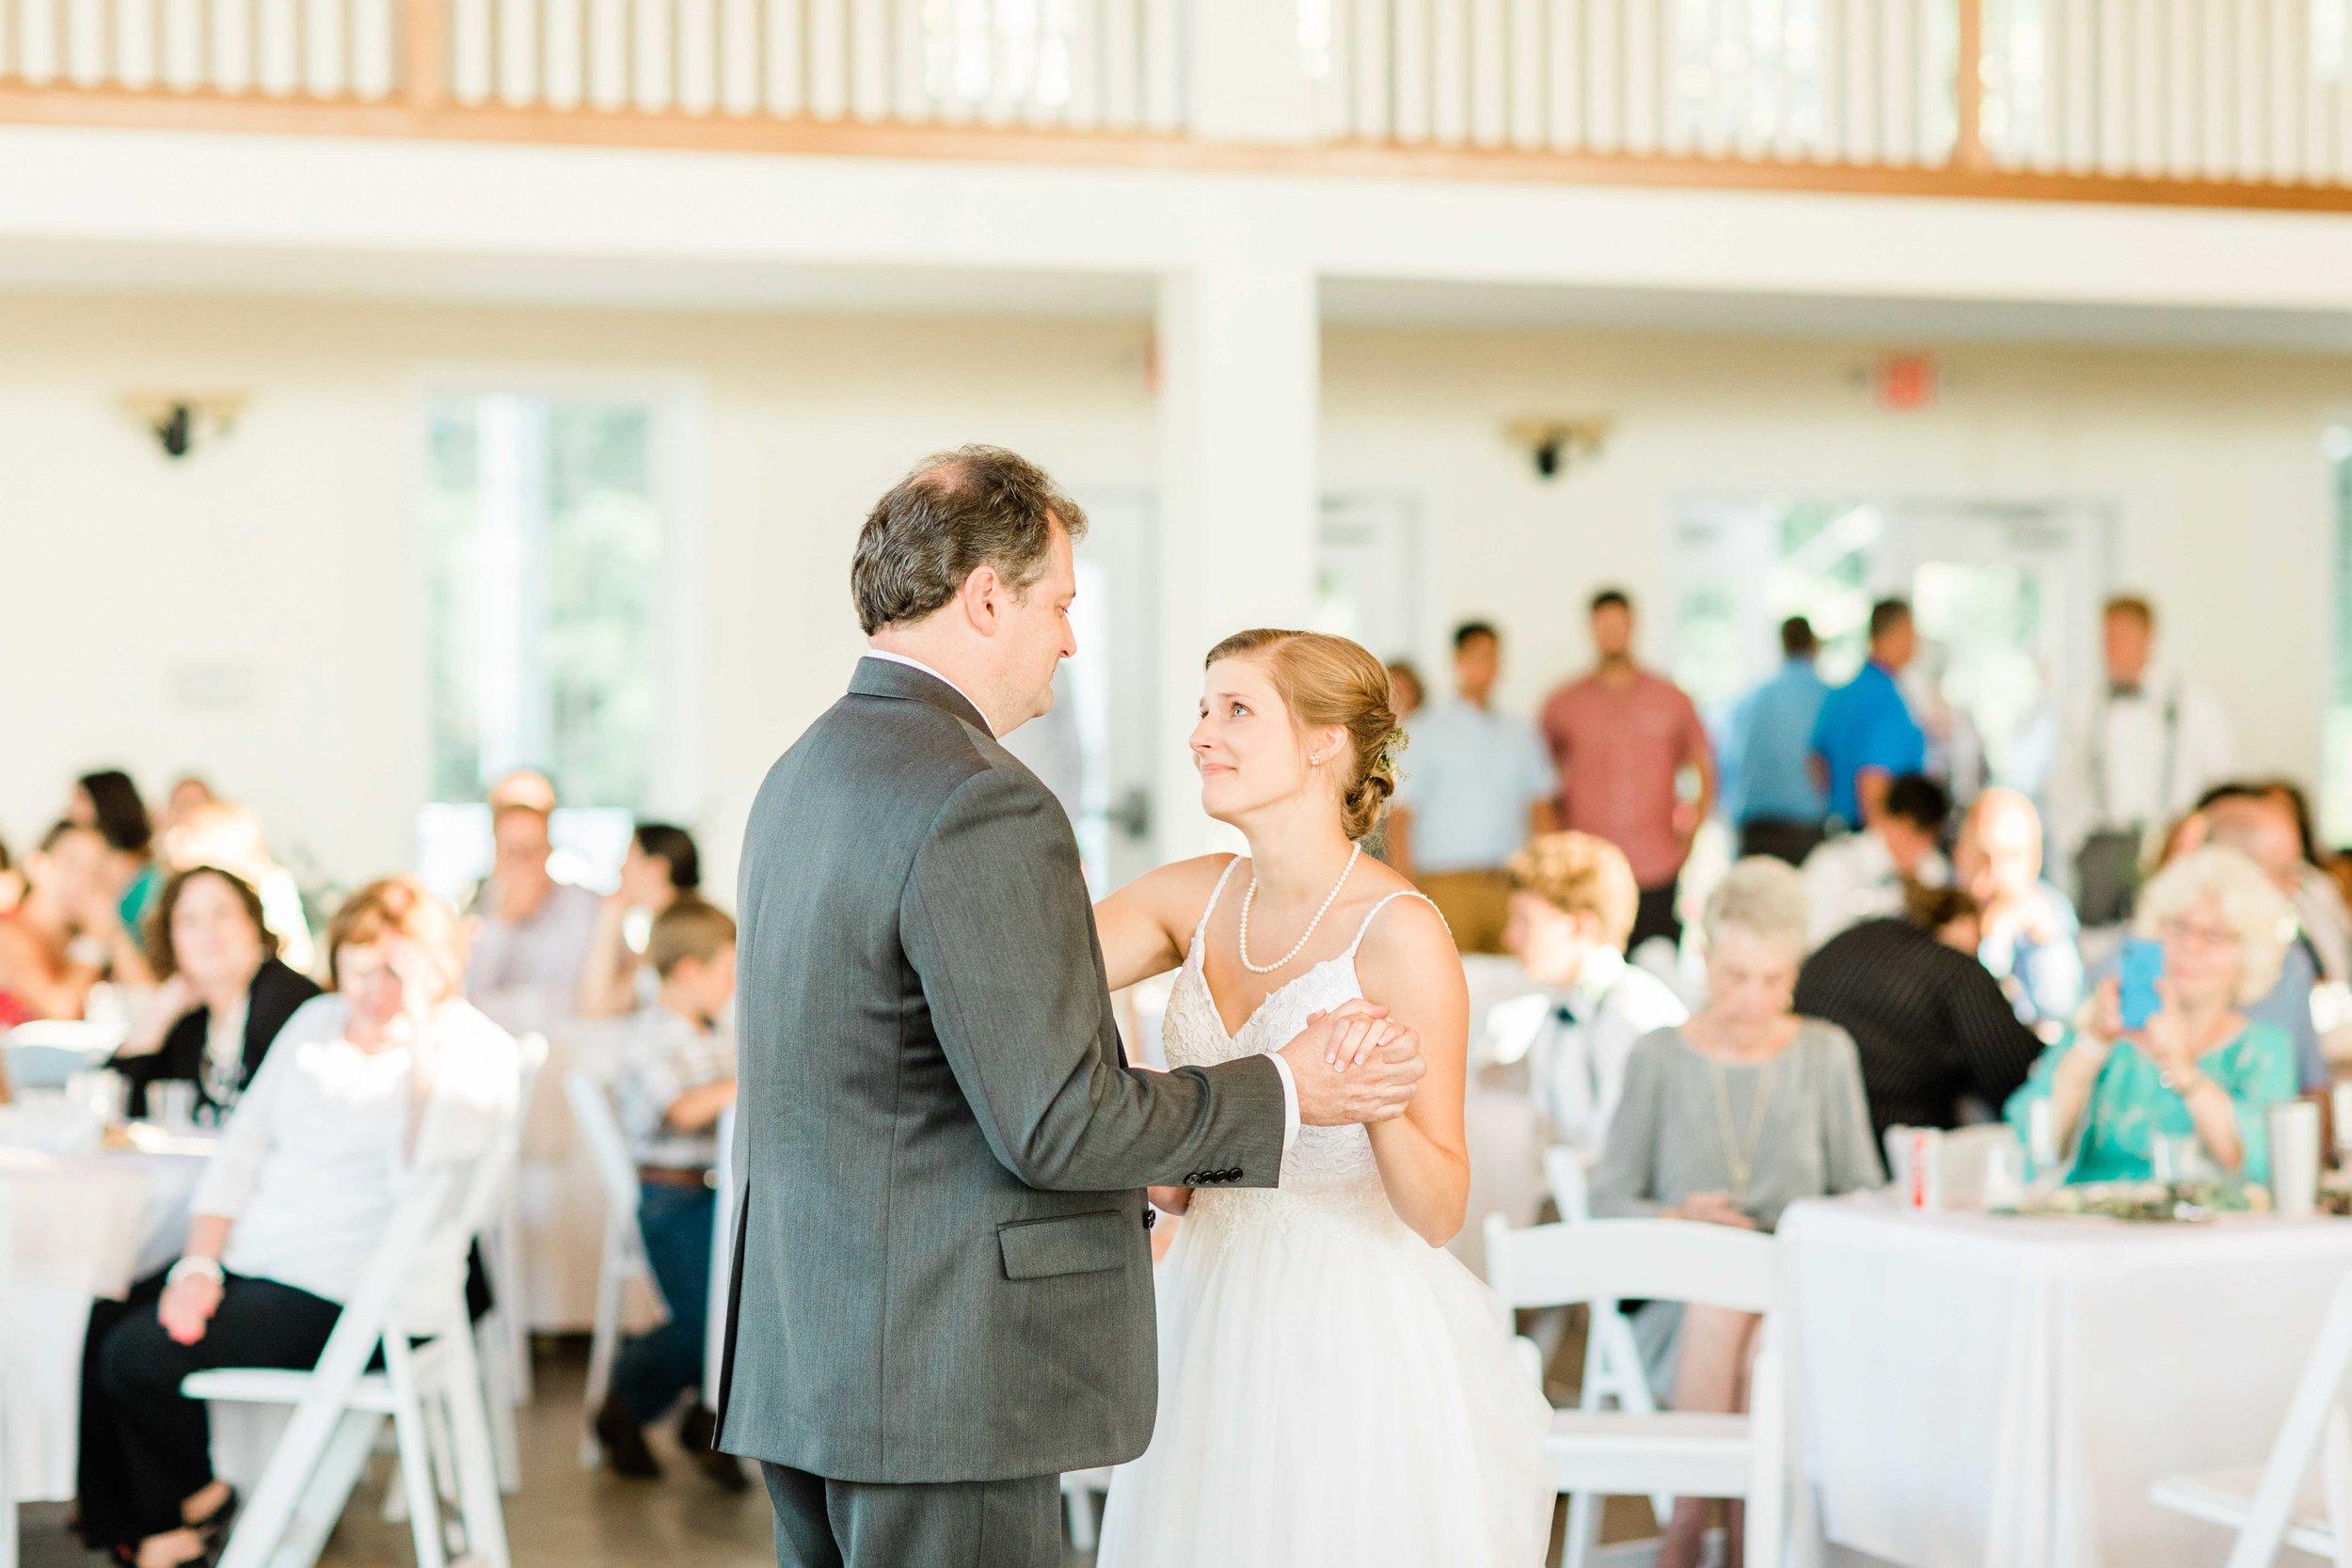 rosewood manor miamisburg wedding photos-5.jpg